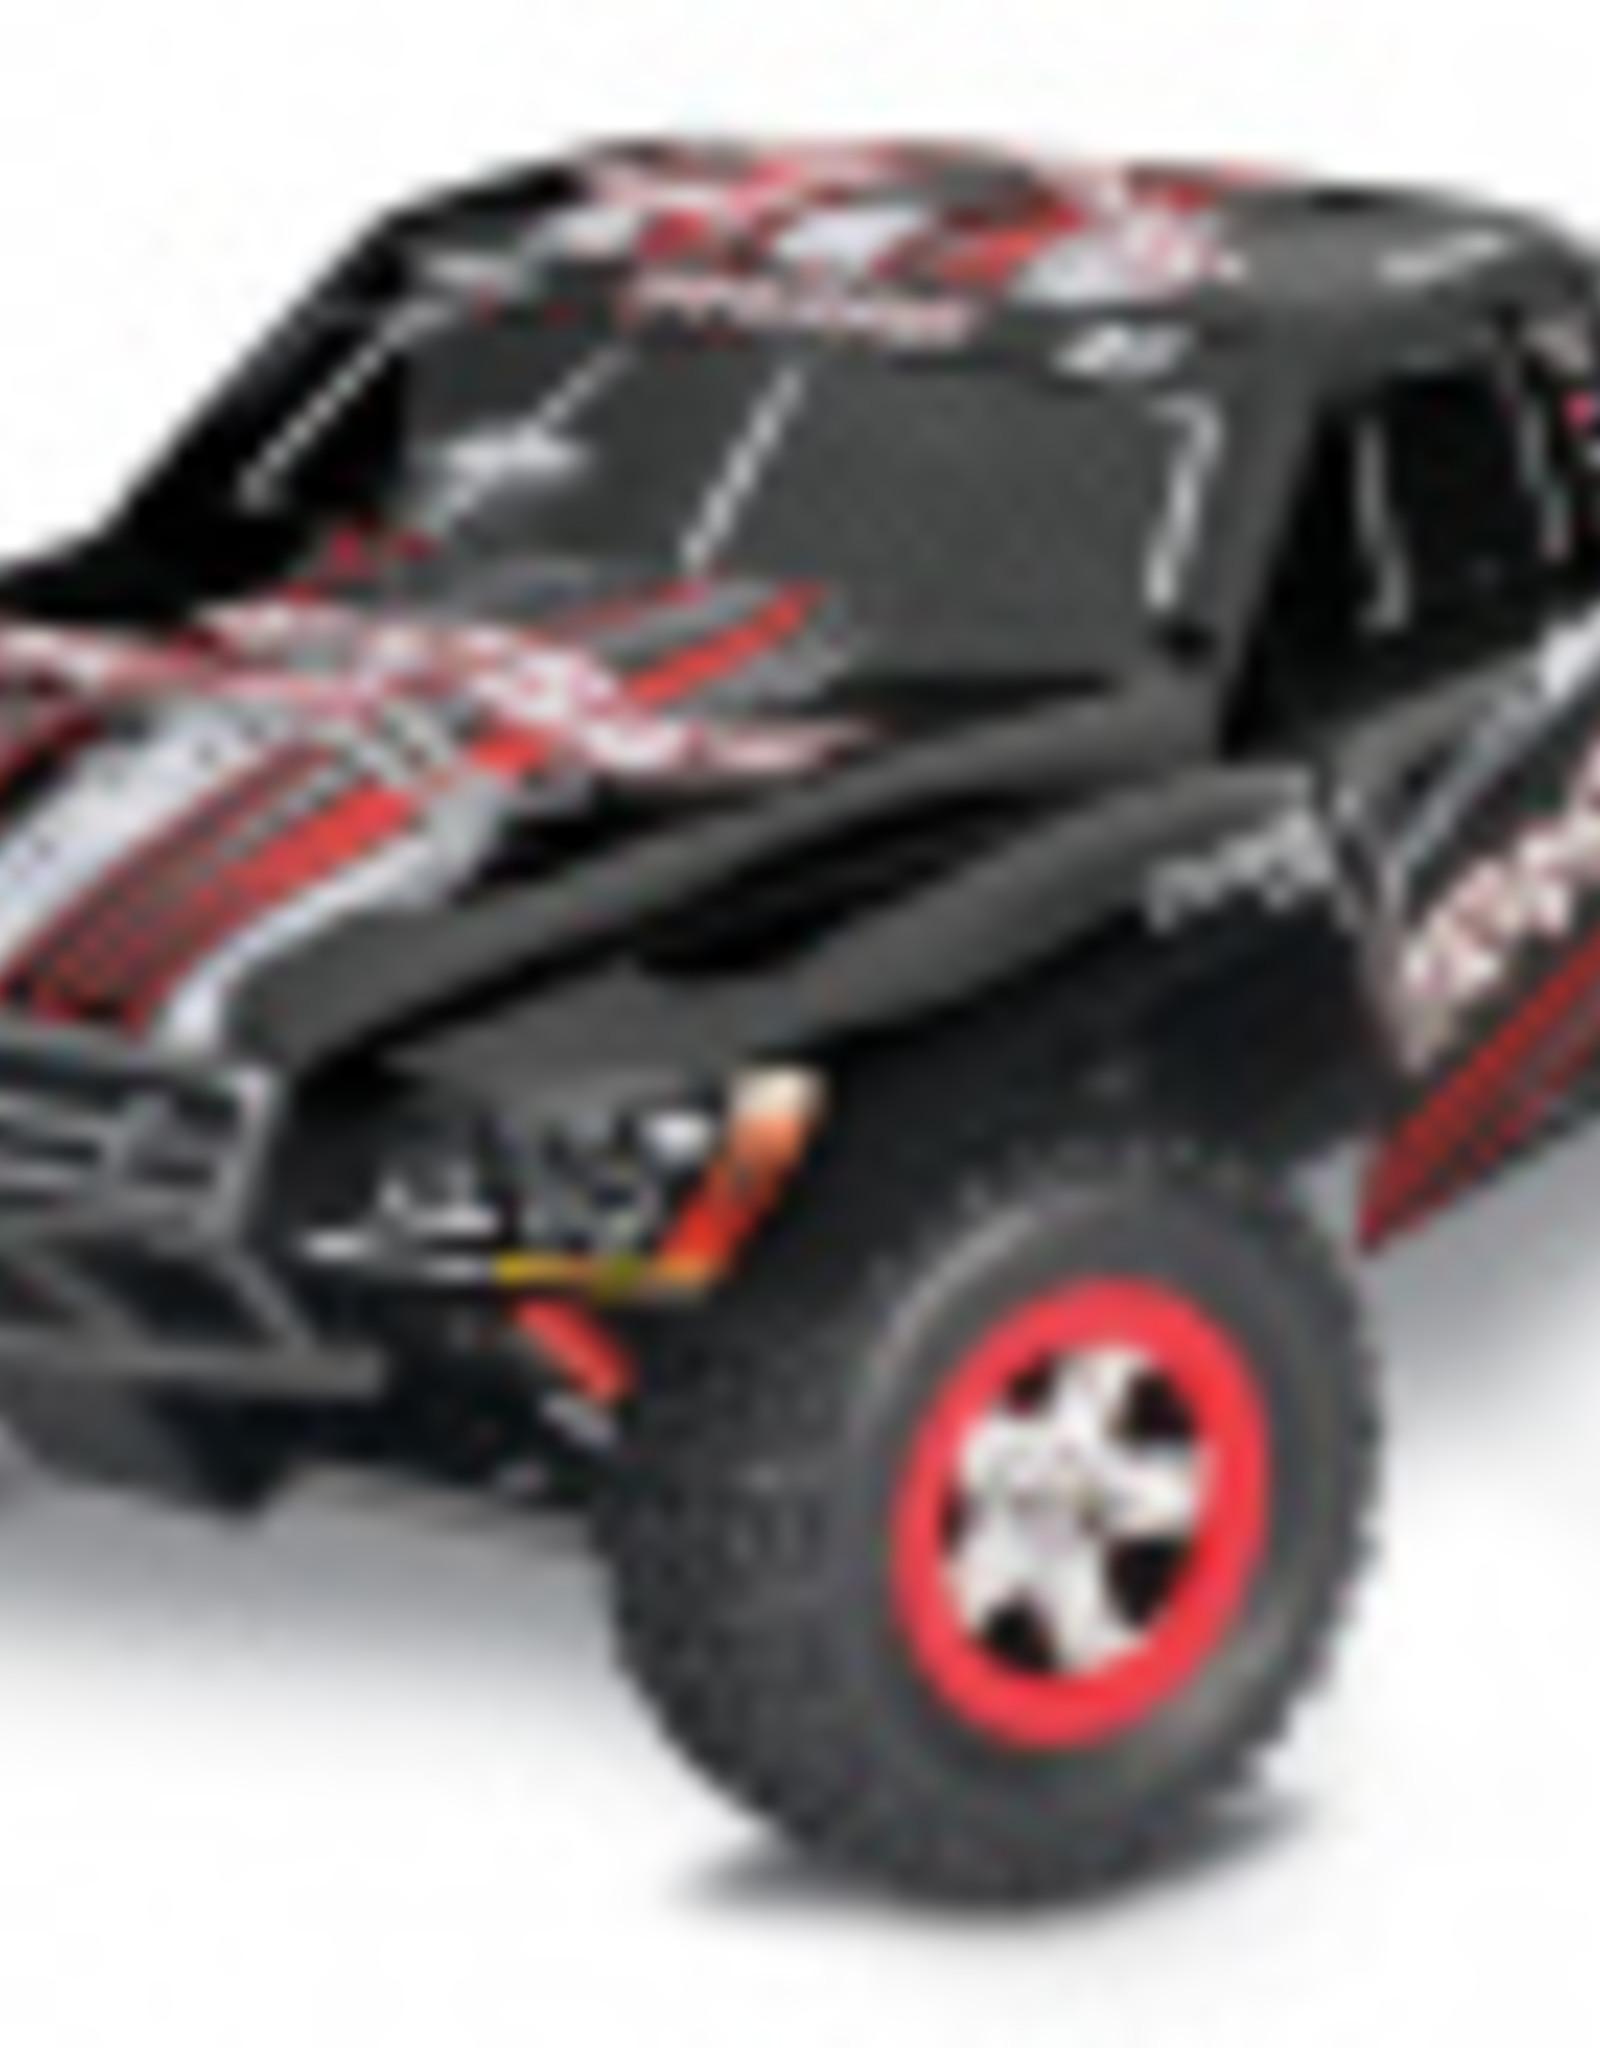 Traxxas Traxxas 1/16 SLASH 4WD RTR W/ ESC XL2.5